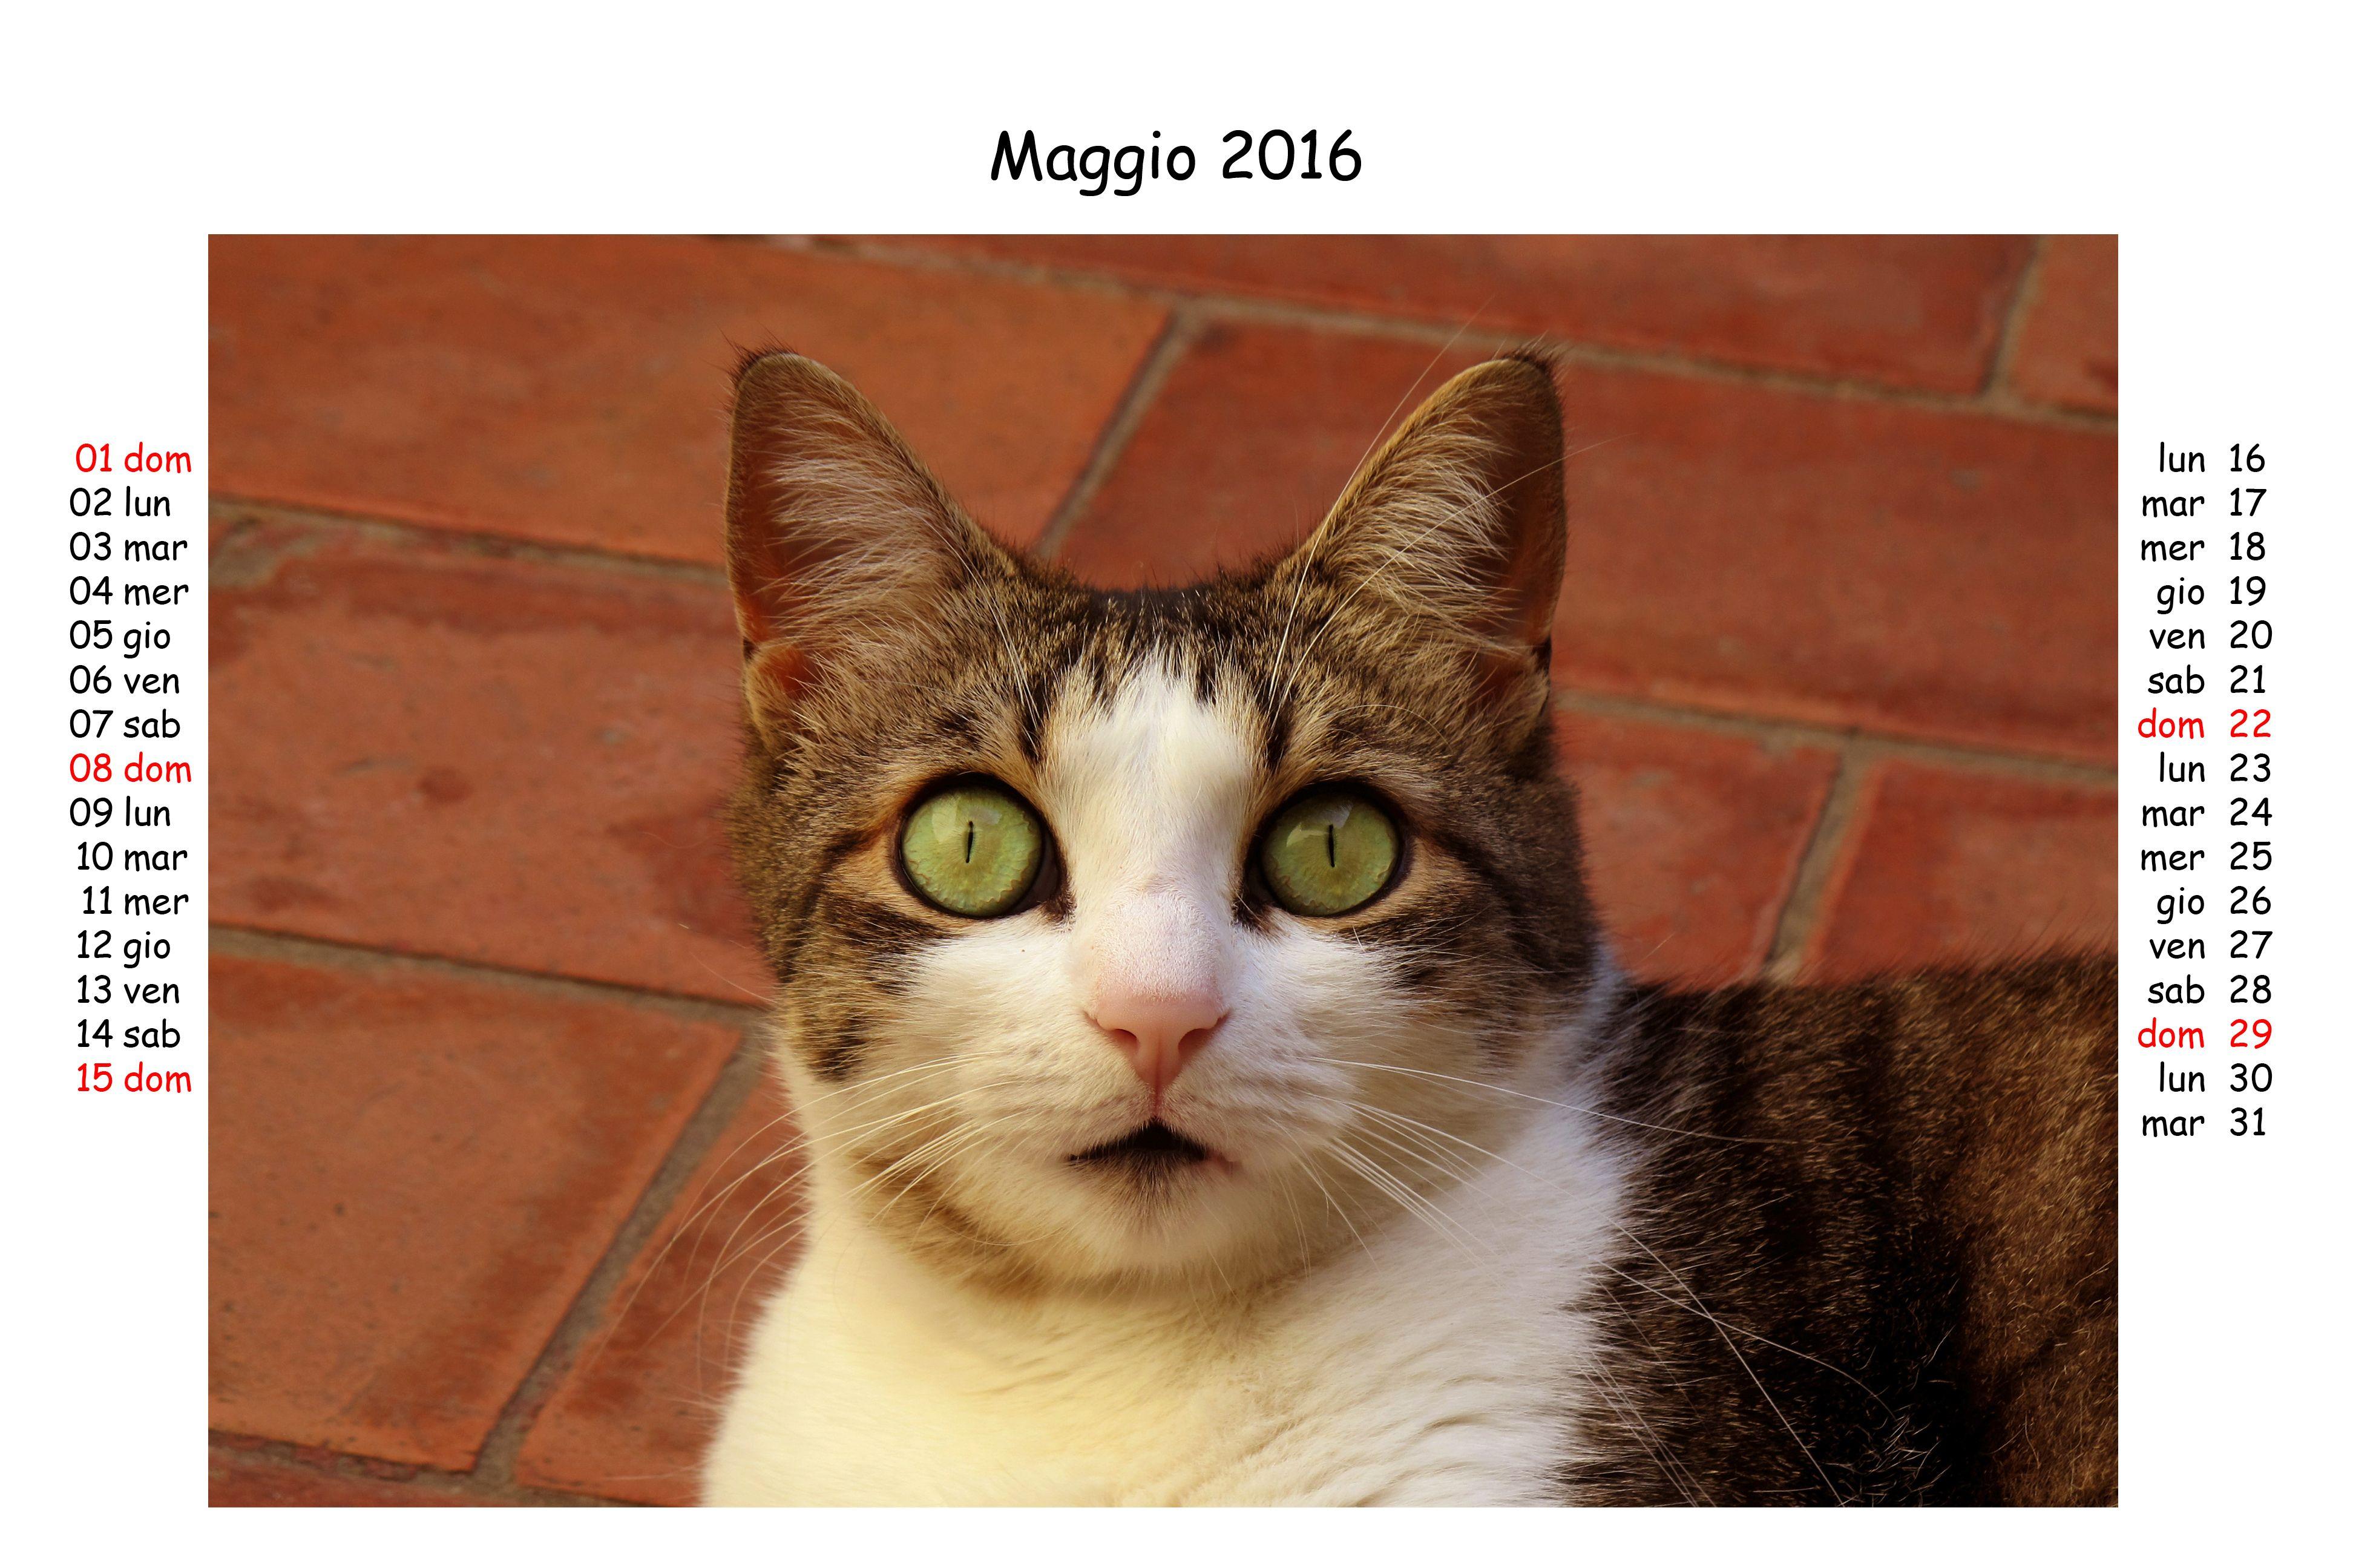 Maggio 2016 Crazy Cat People Cat People Cats